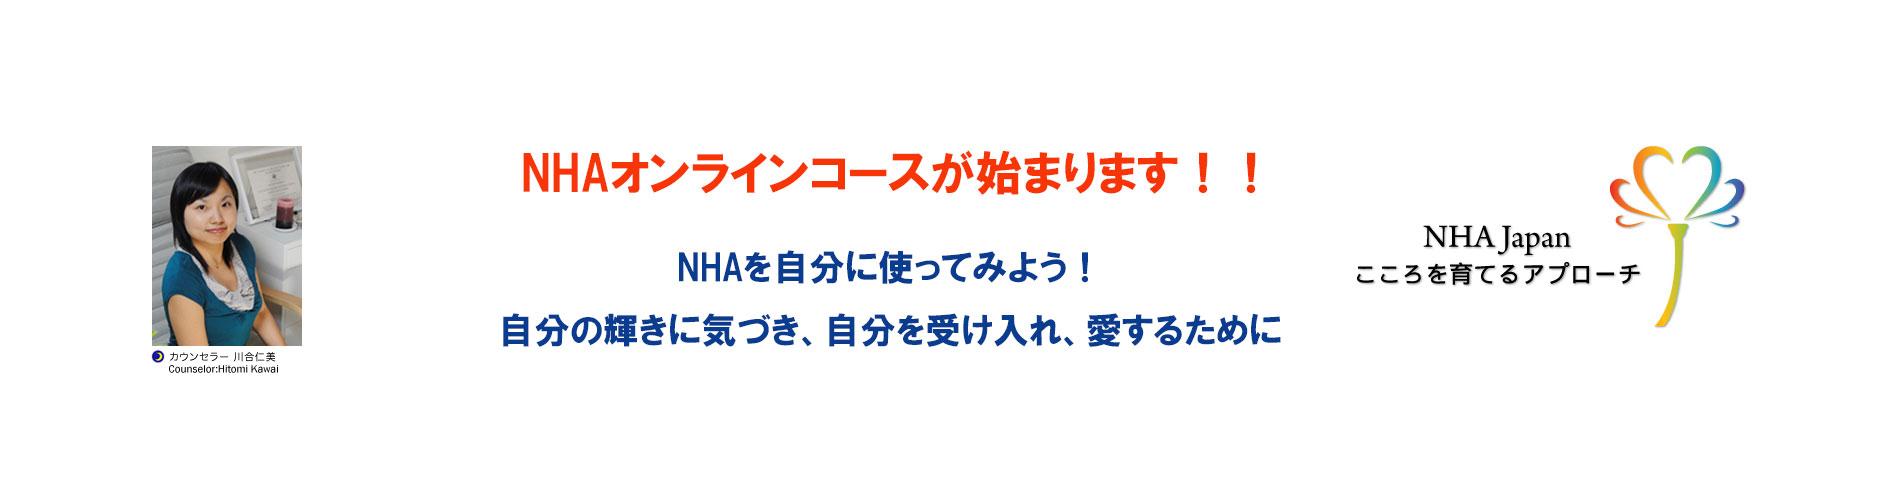 NHAオンラインコース 自分編